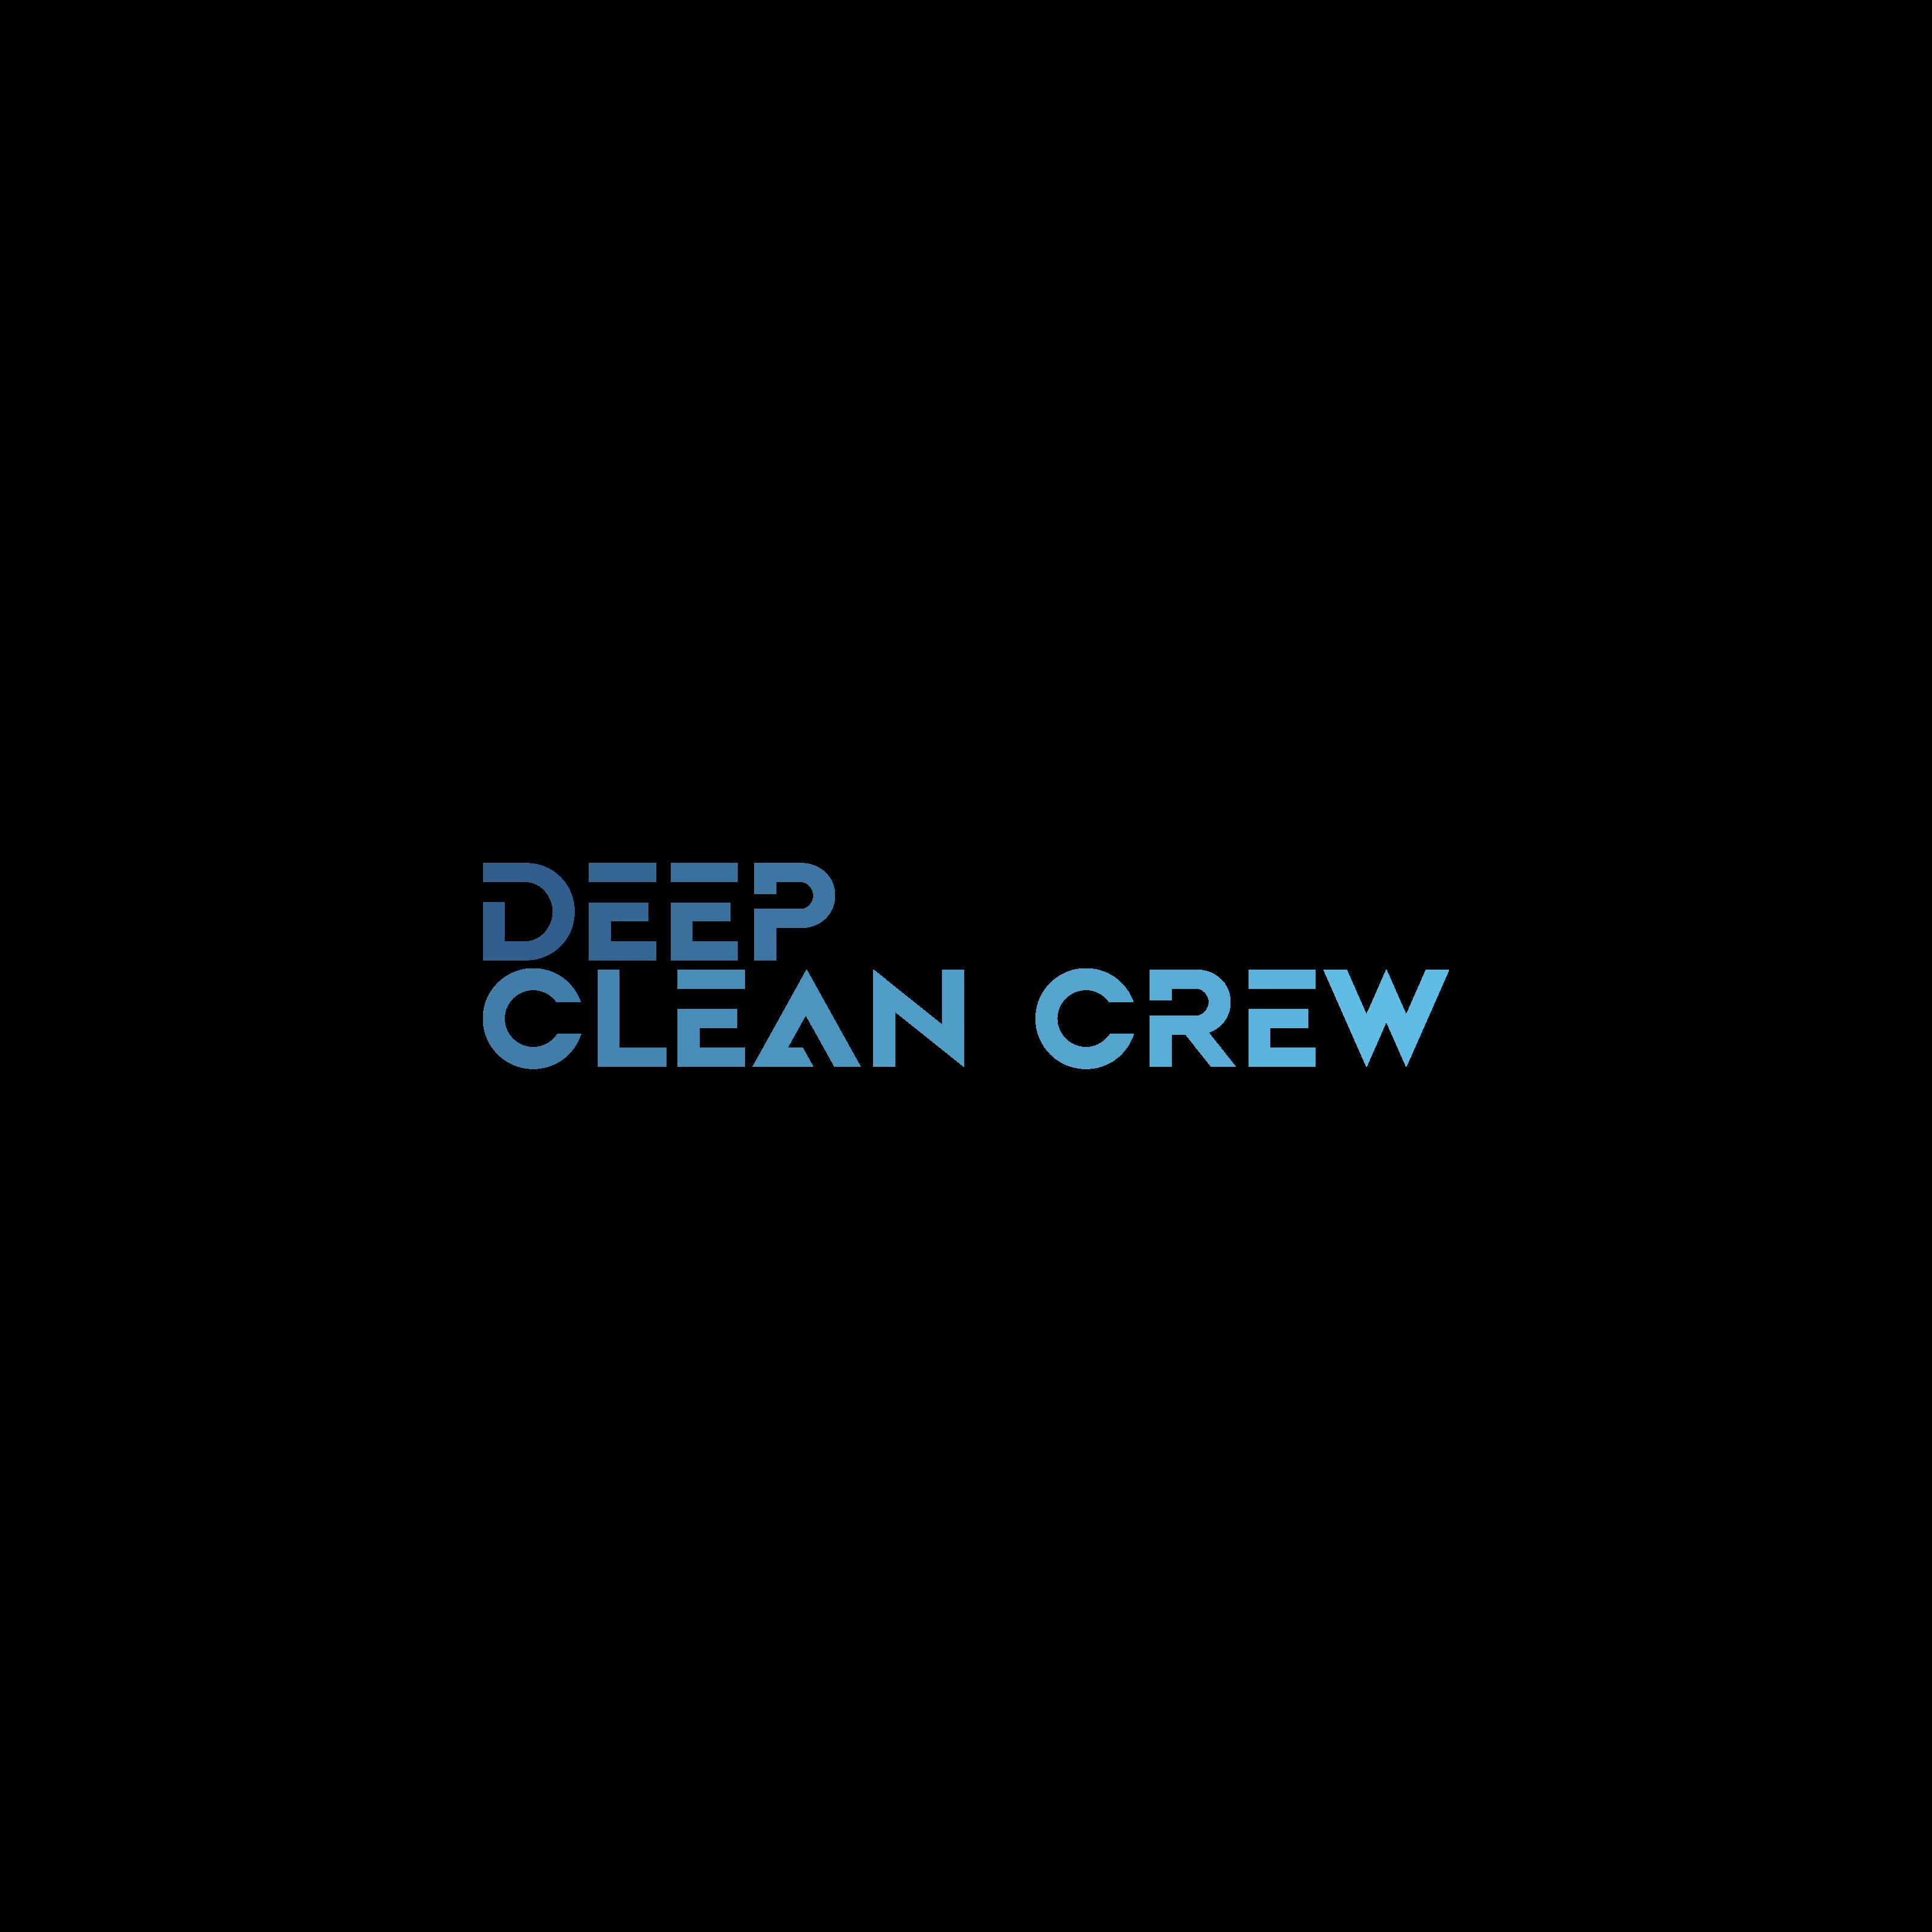 Deep Clean Crew